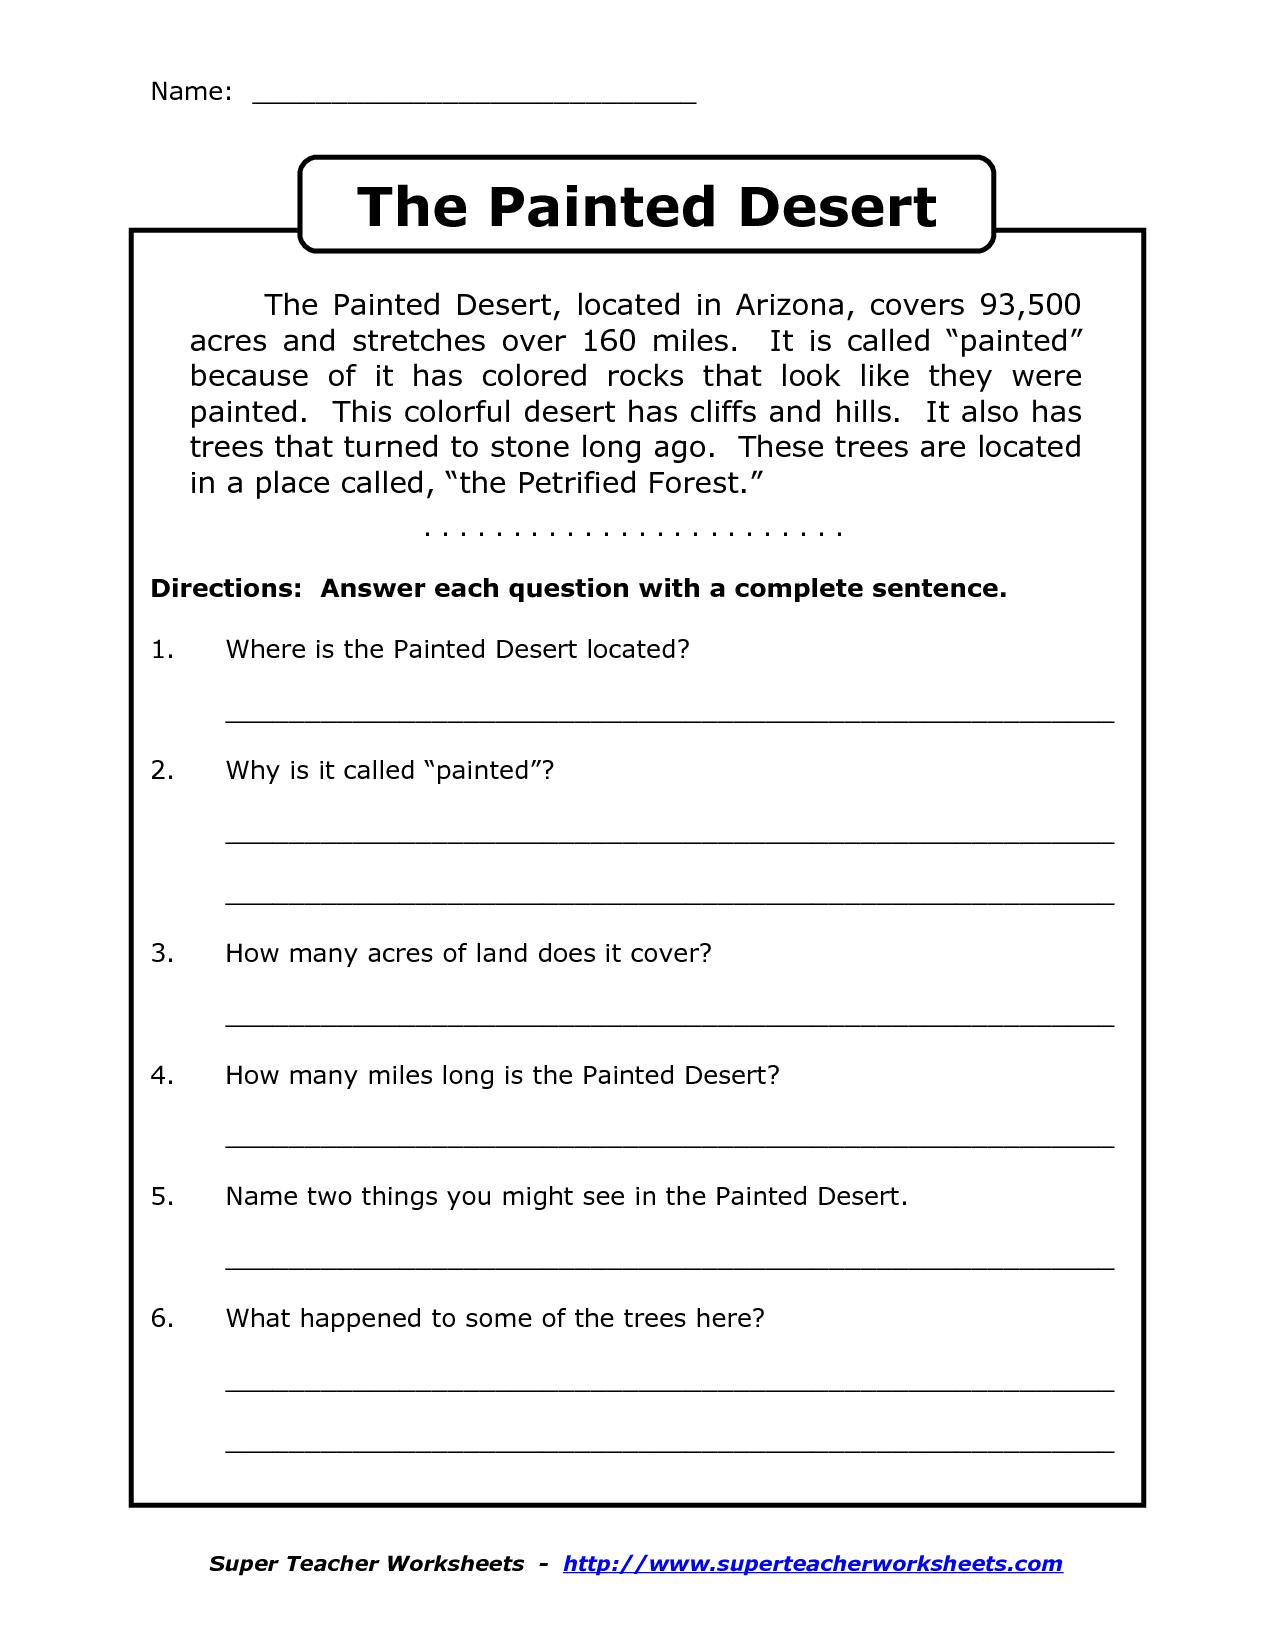 Reading Worksheets For 4Th Grade | Reading Comprehension Worksheets - Free Printable Comprehension Worksheets For Grade 5